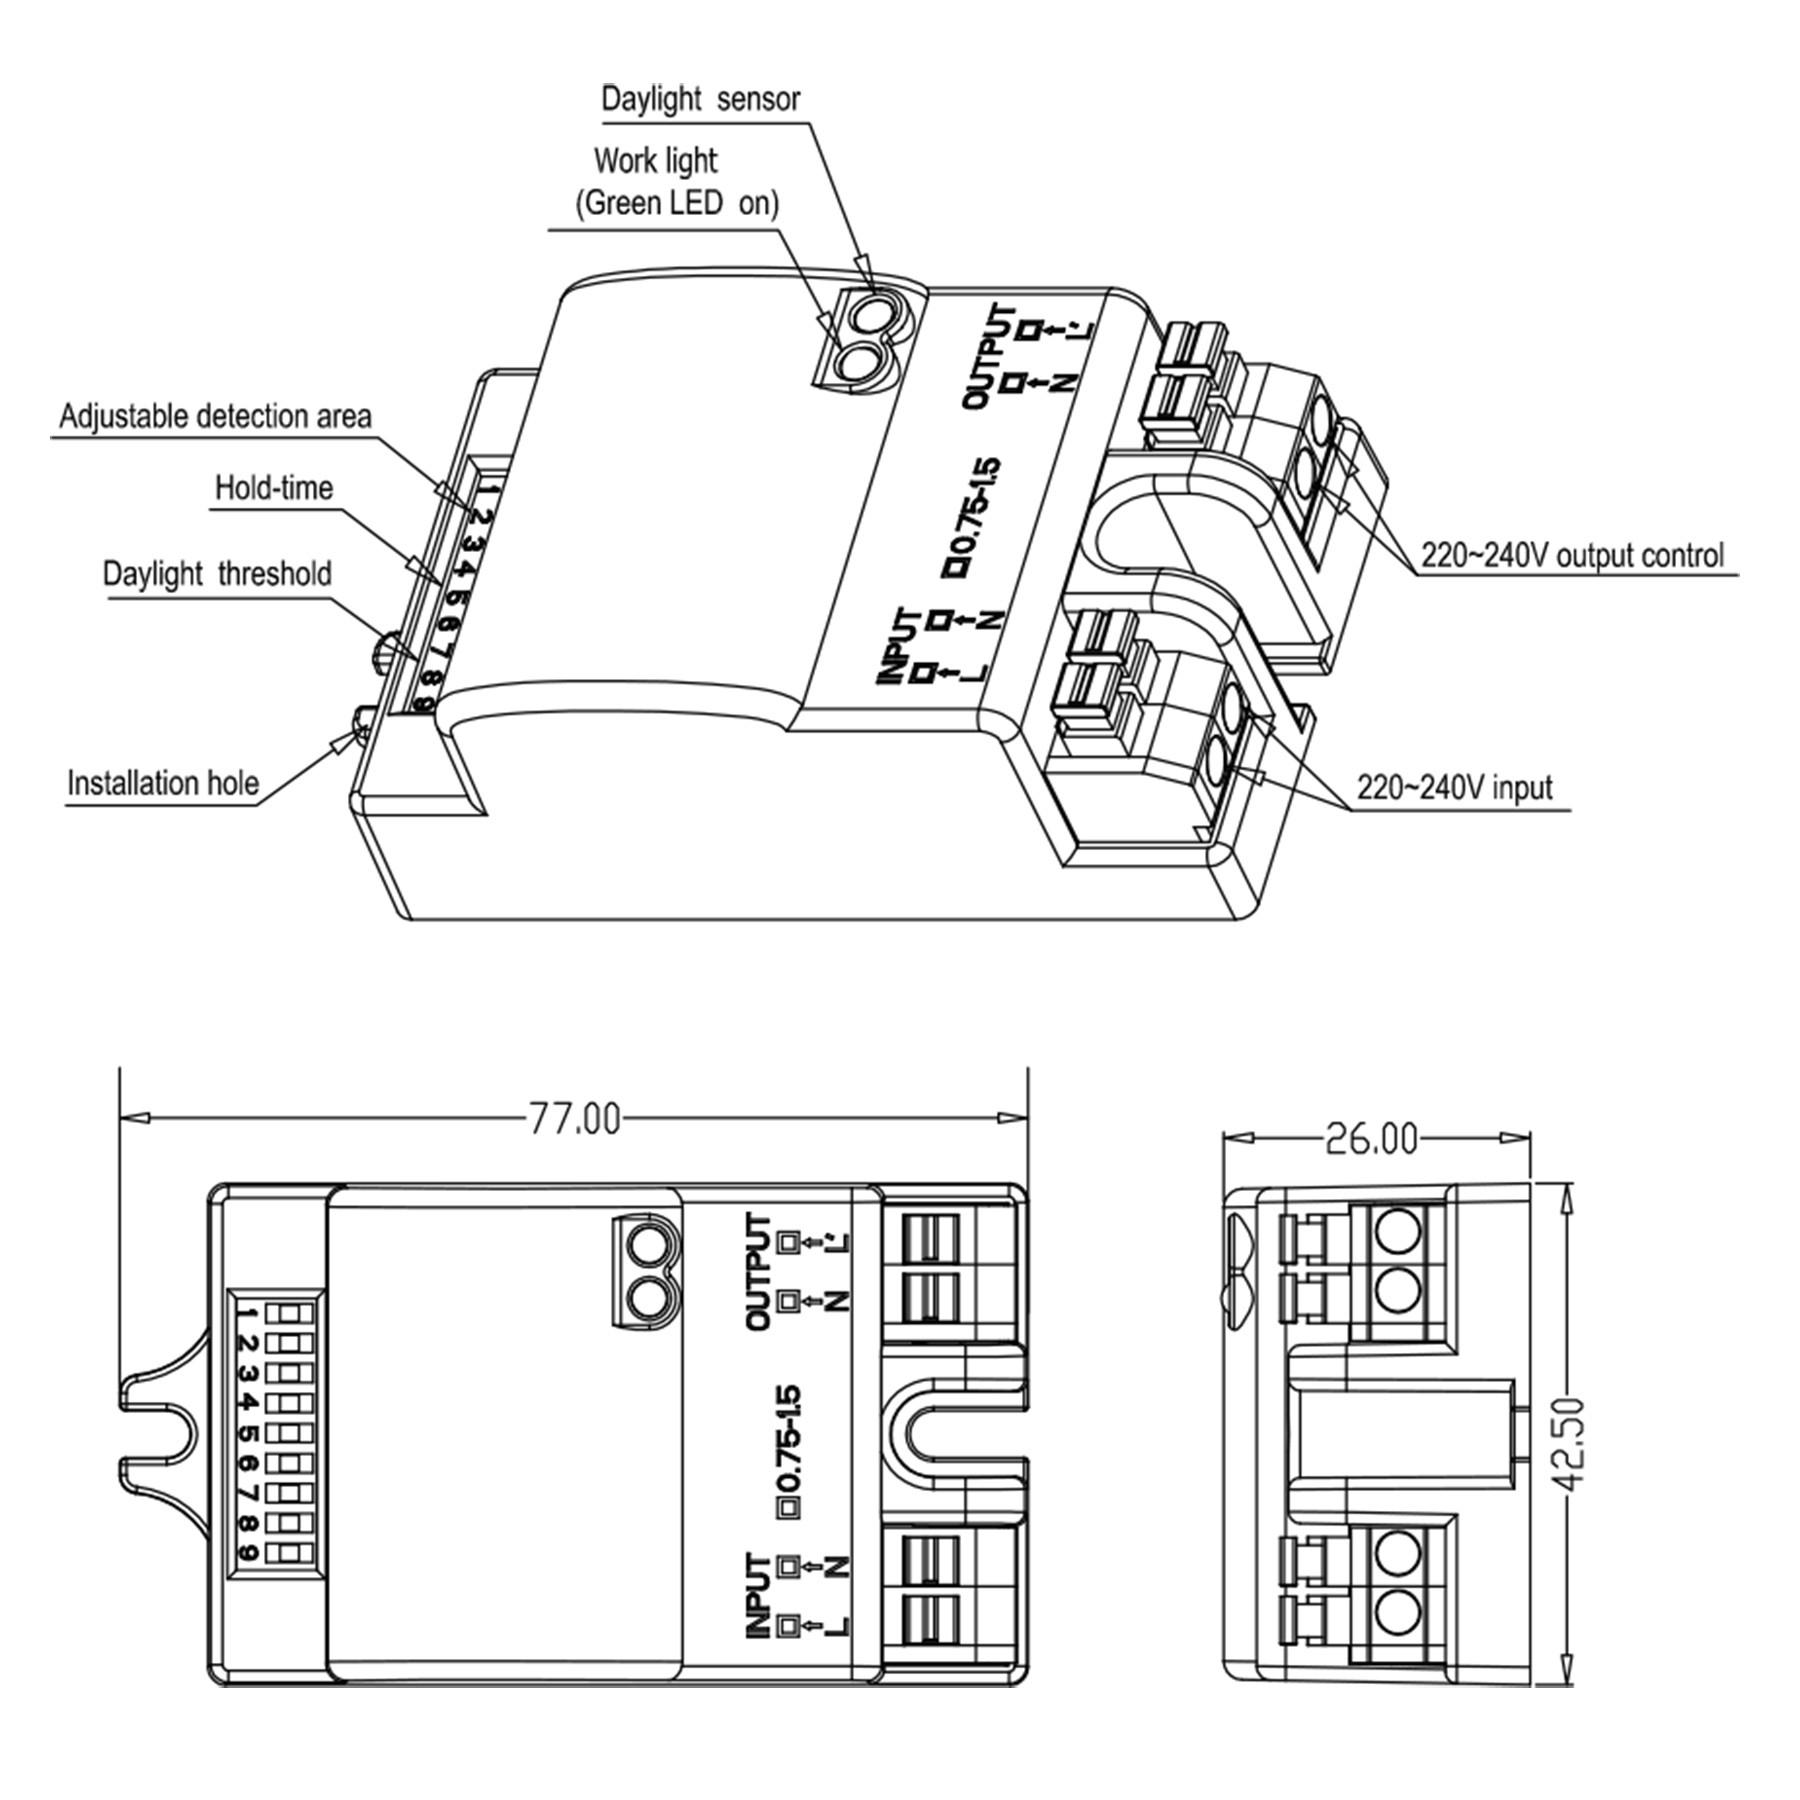 Ceiling Mount Occupancy Sensor Wiring Diagram Sample